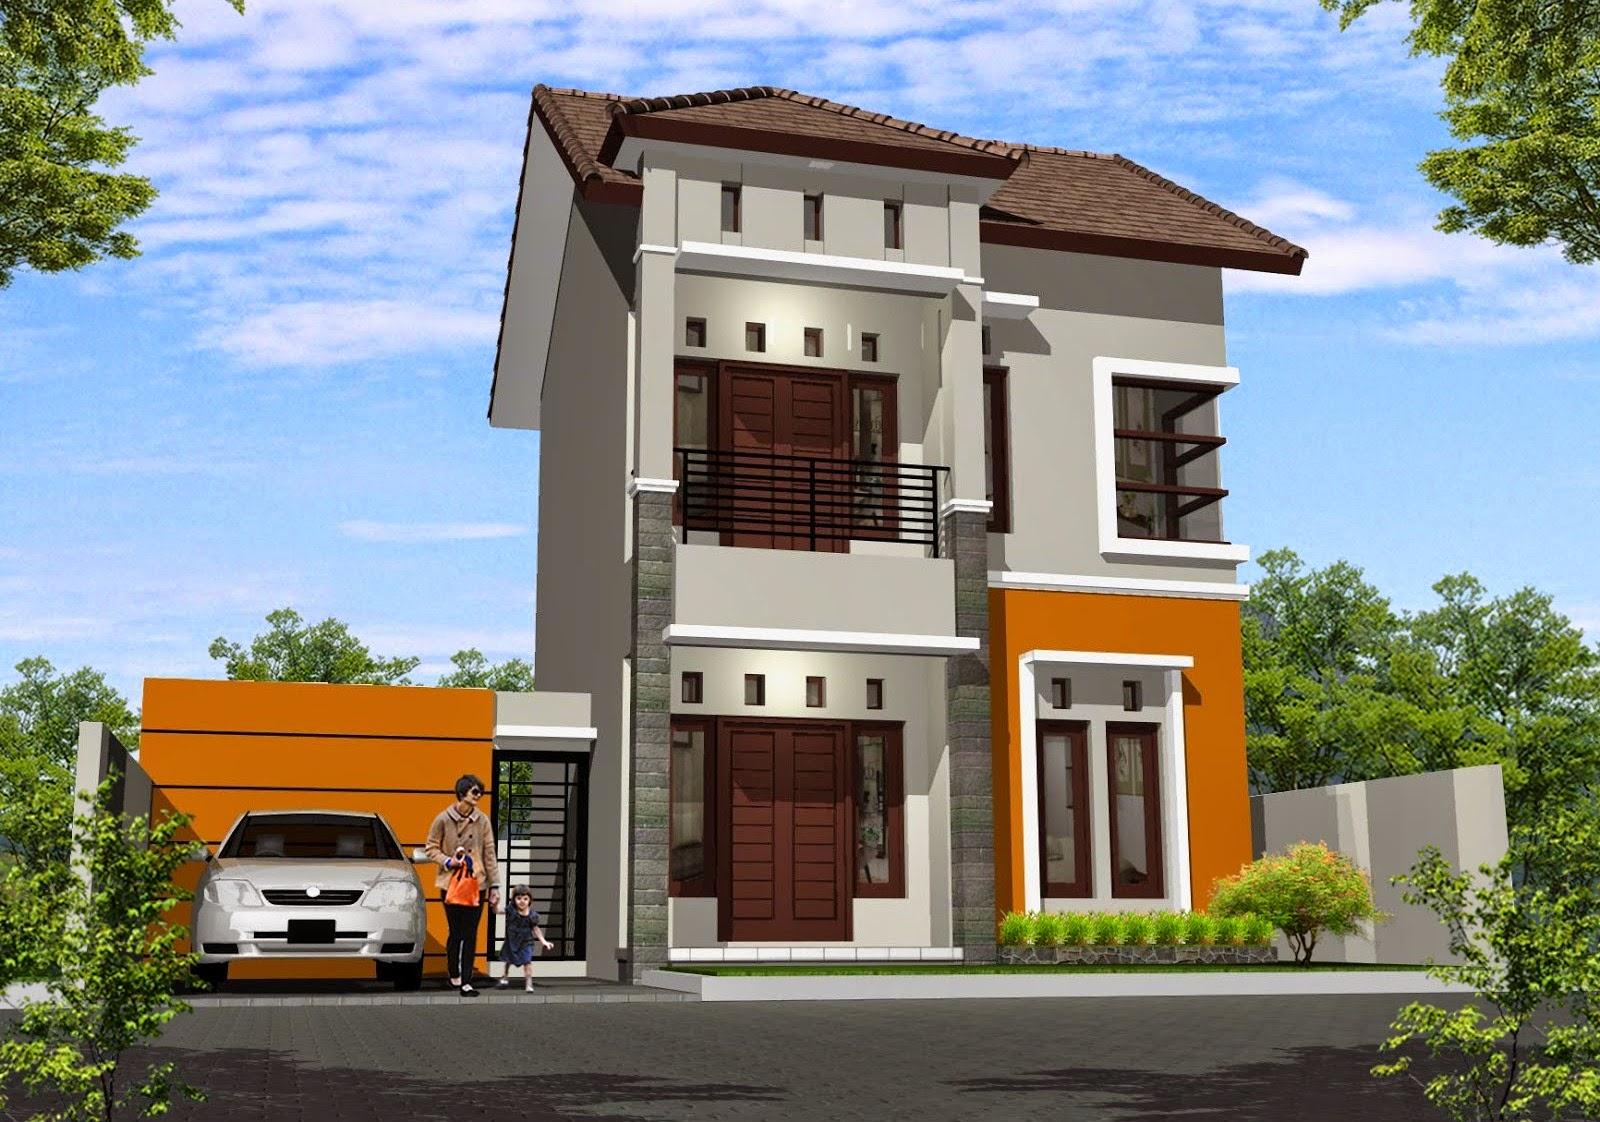 10 desain denah rumah minimalis modern 2 lantai type 45 - Desain Rumah Minimalis 2 Lantai Modern Sederhana